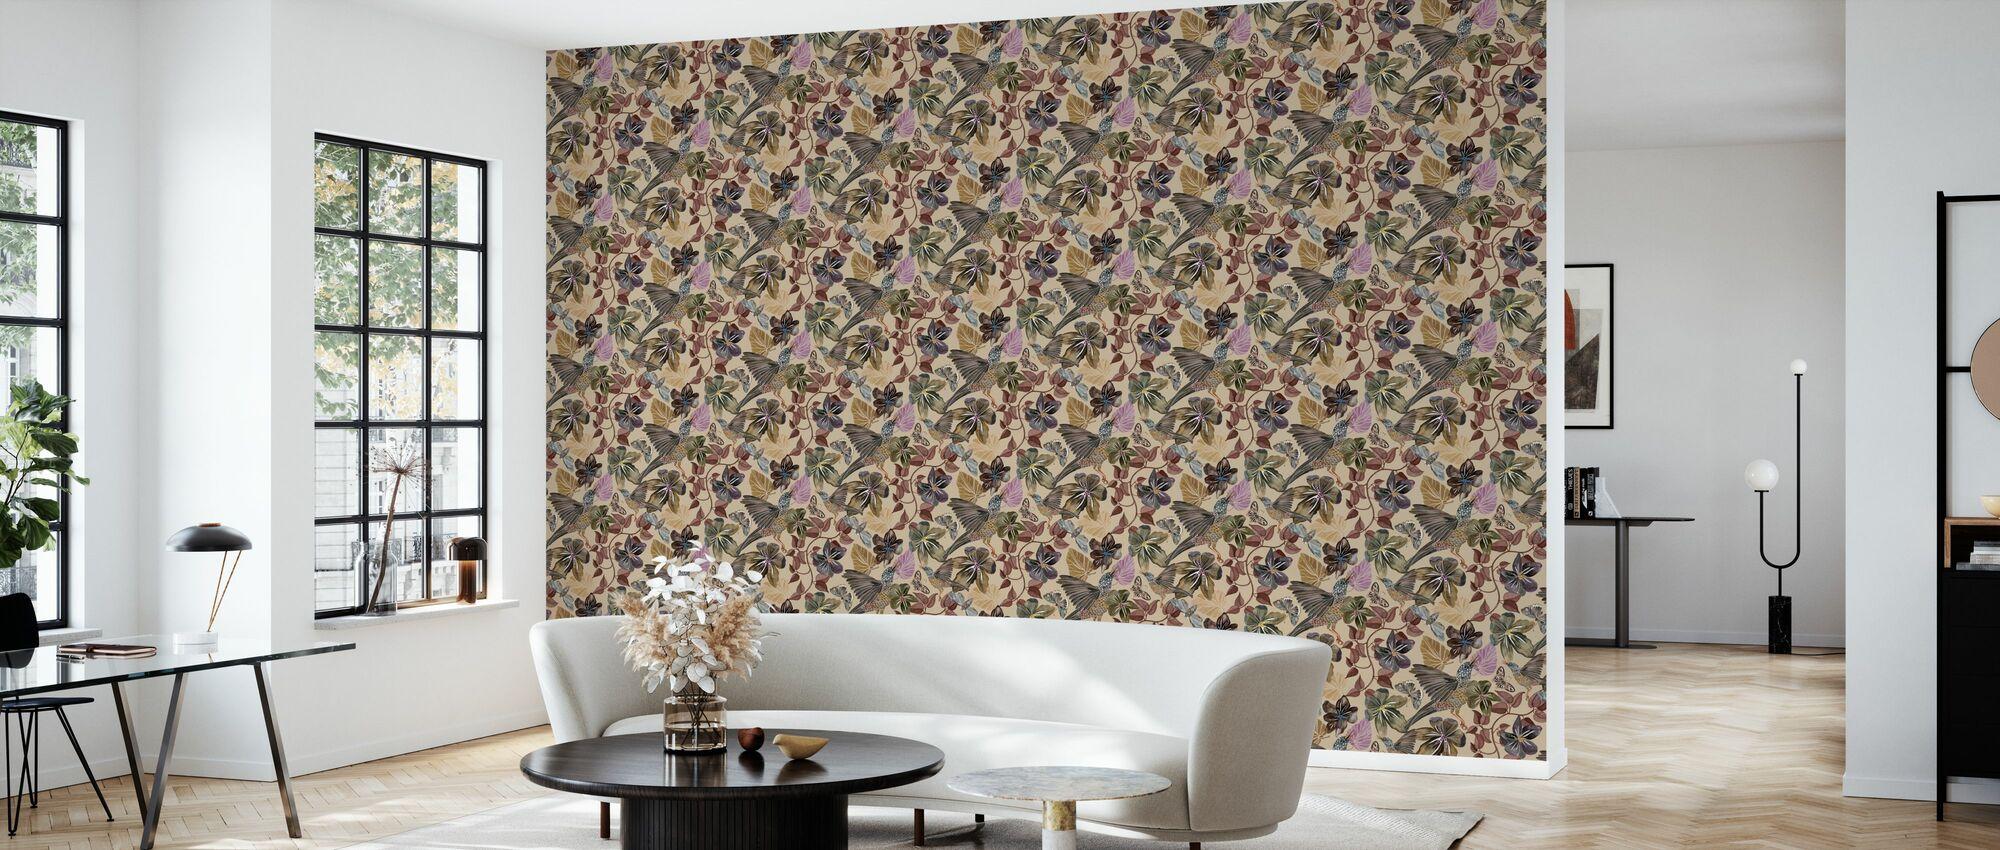 Blues  - Nougat - Wallpaper - Living Room